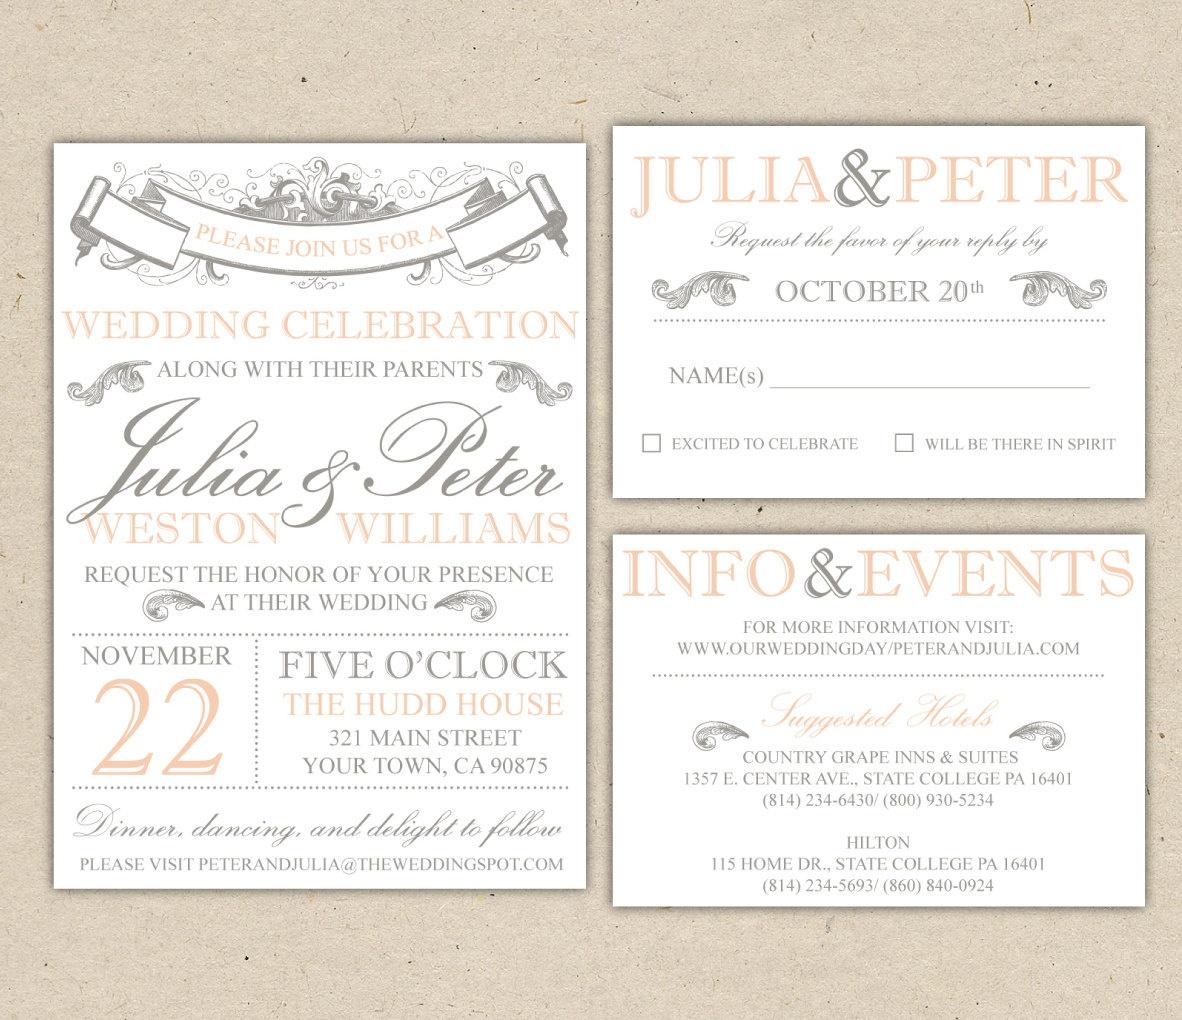 Free Wedding Invitation Templates For Word   Marina Gallery Fine Art - Free Printable Wedding Invitation Templates